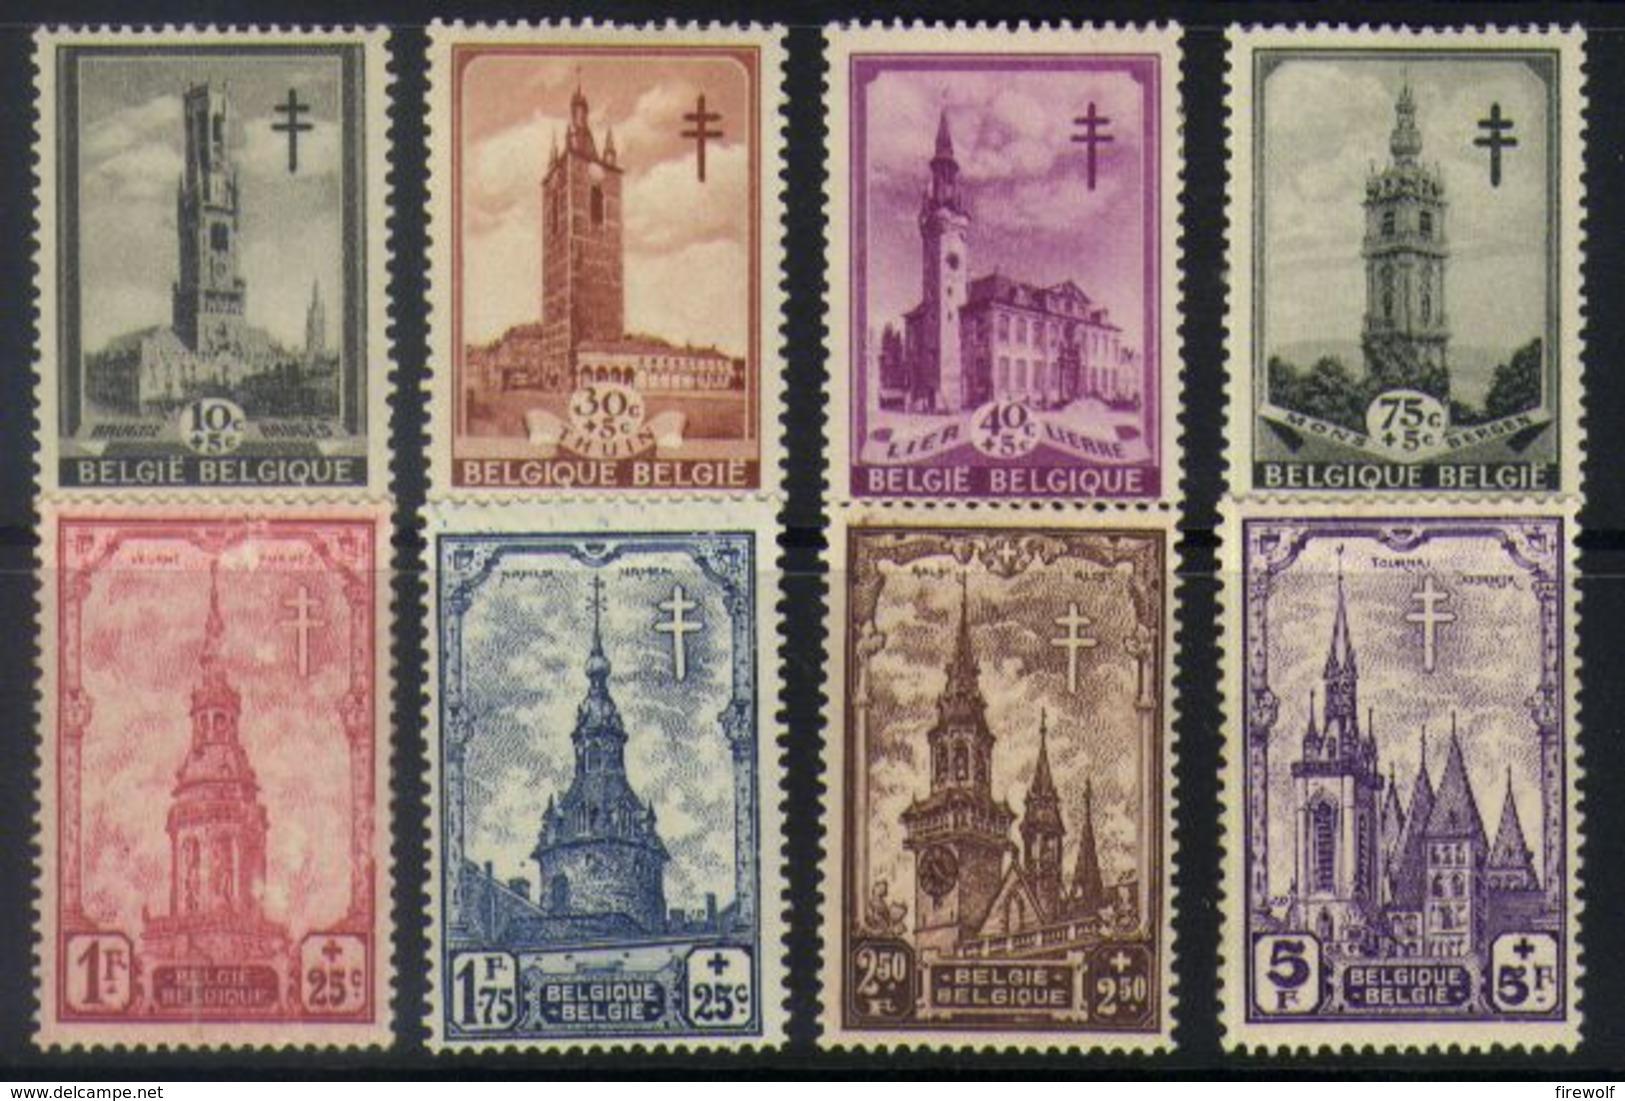 E17 - Belgium - 1939 - OBP 519/526 Mint Hinged - Turberculose Control / Belfries - Ungebraucht